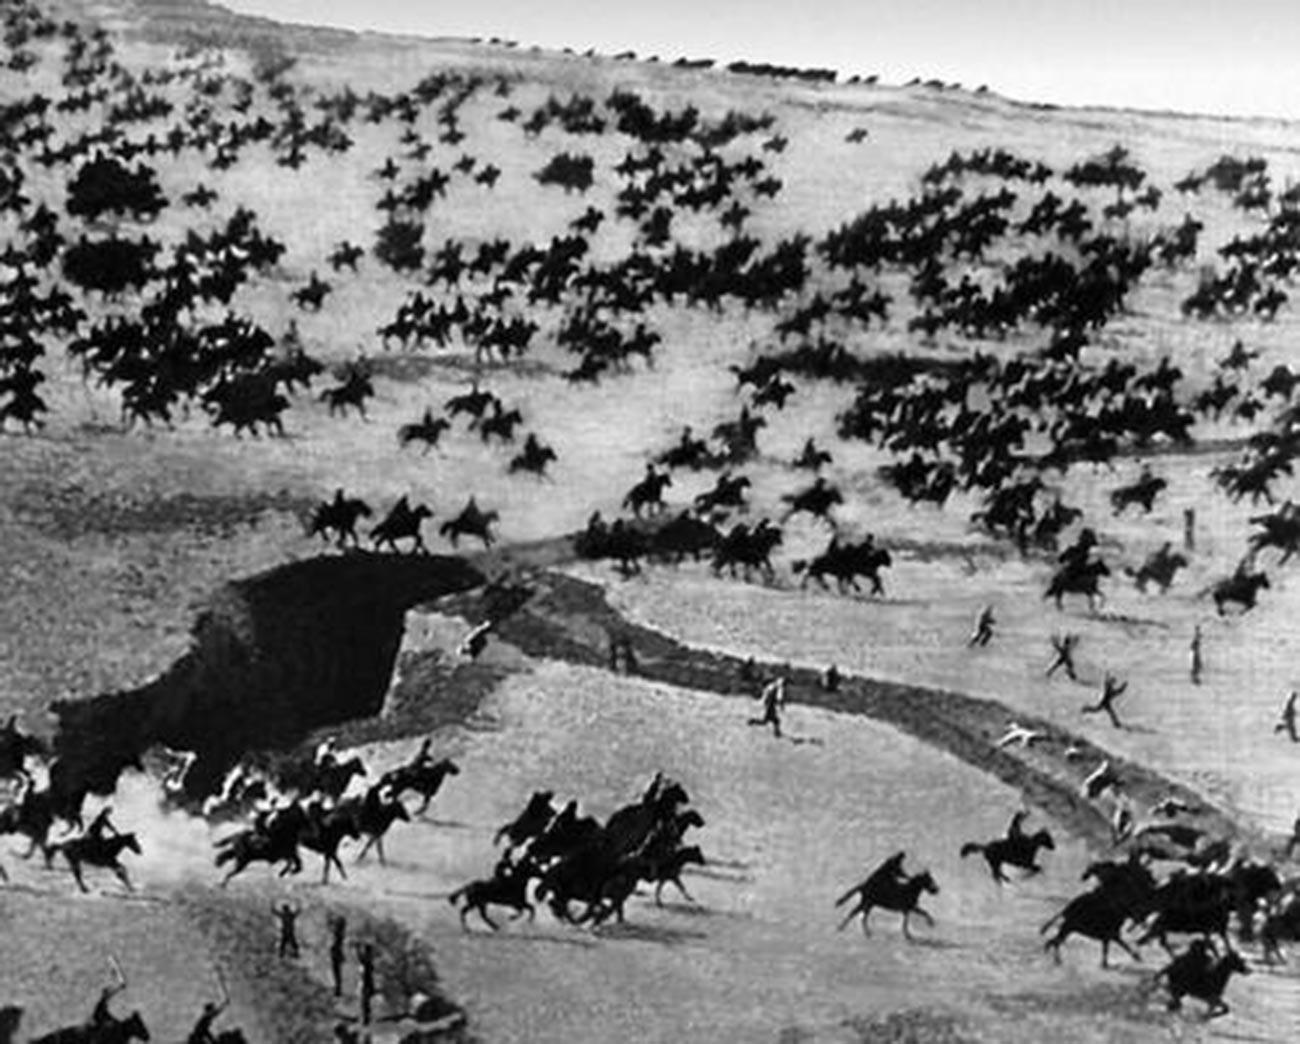 Crvena konjica u napadu. 1919.